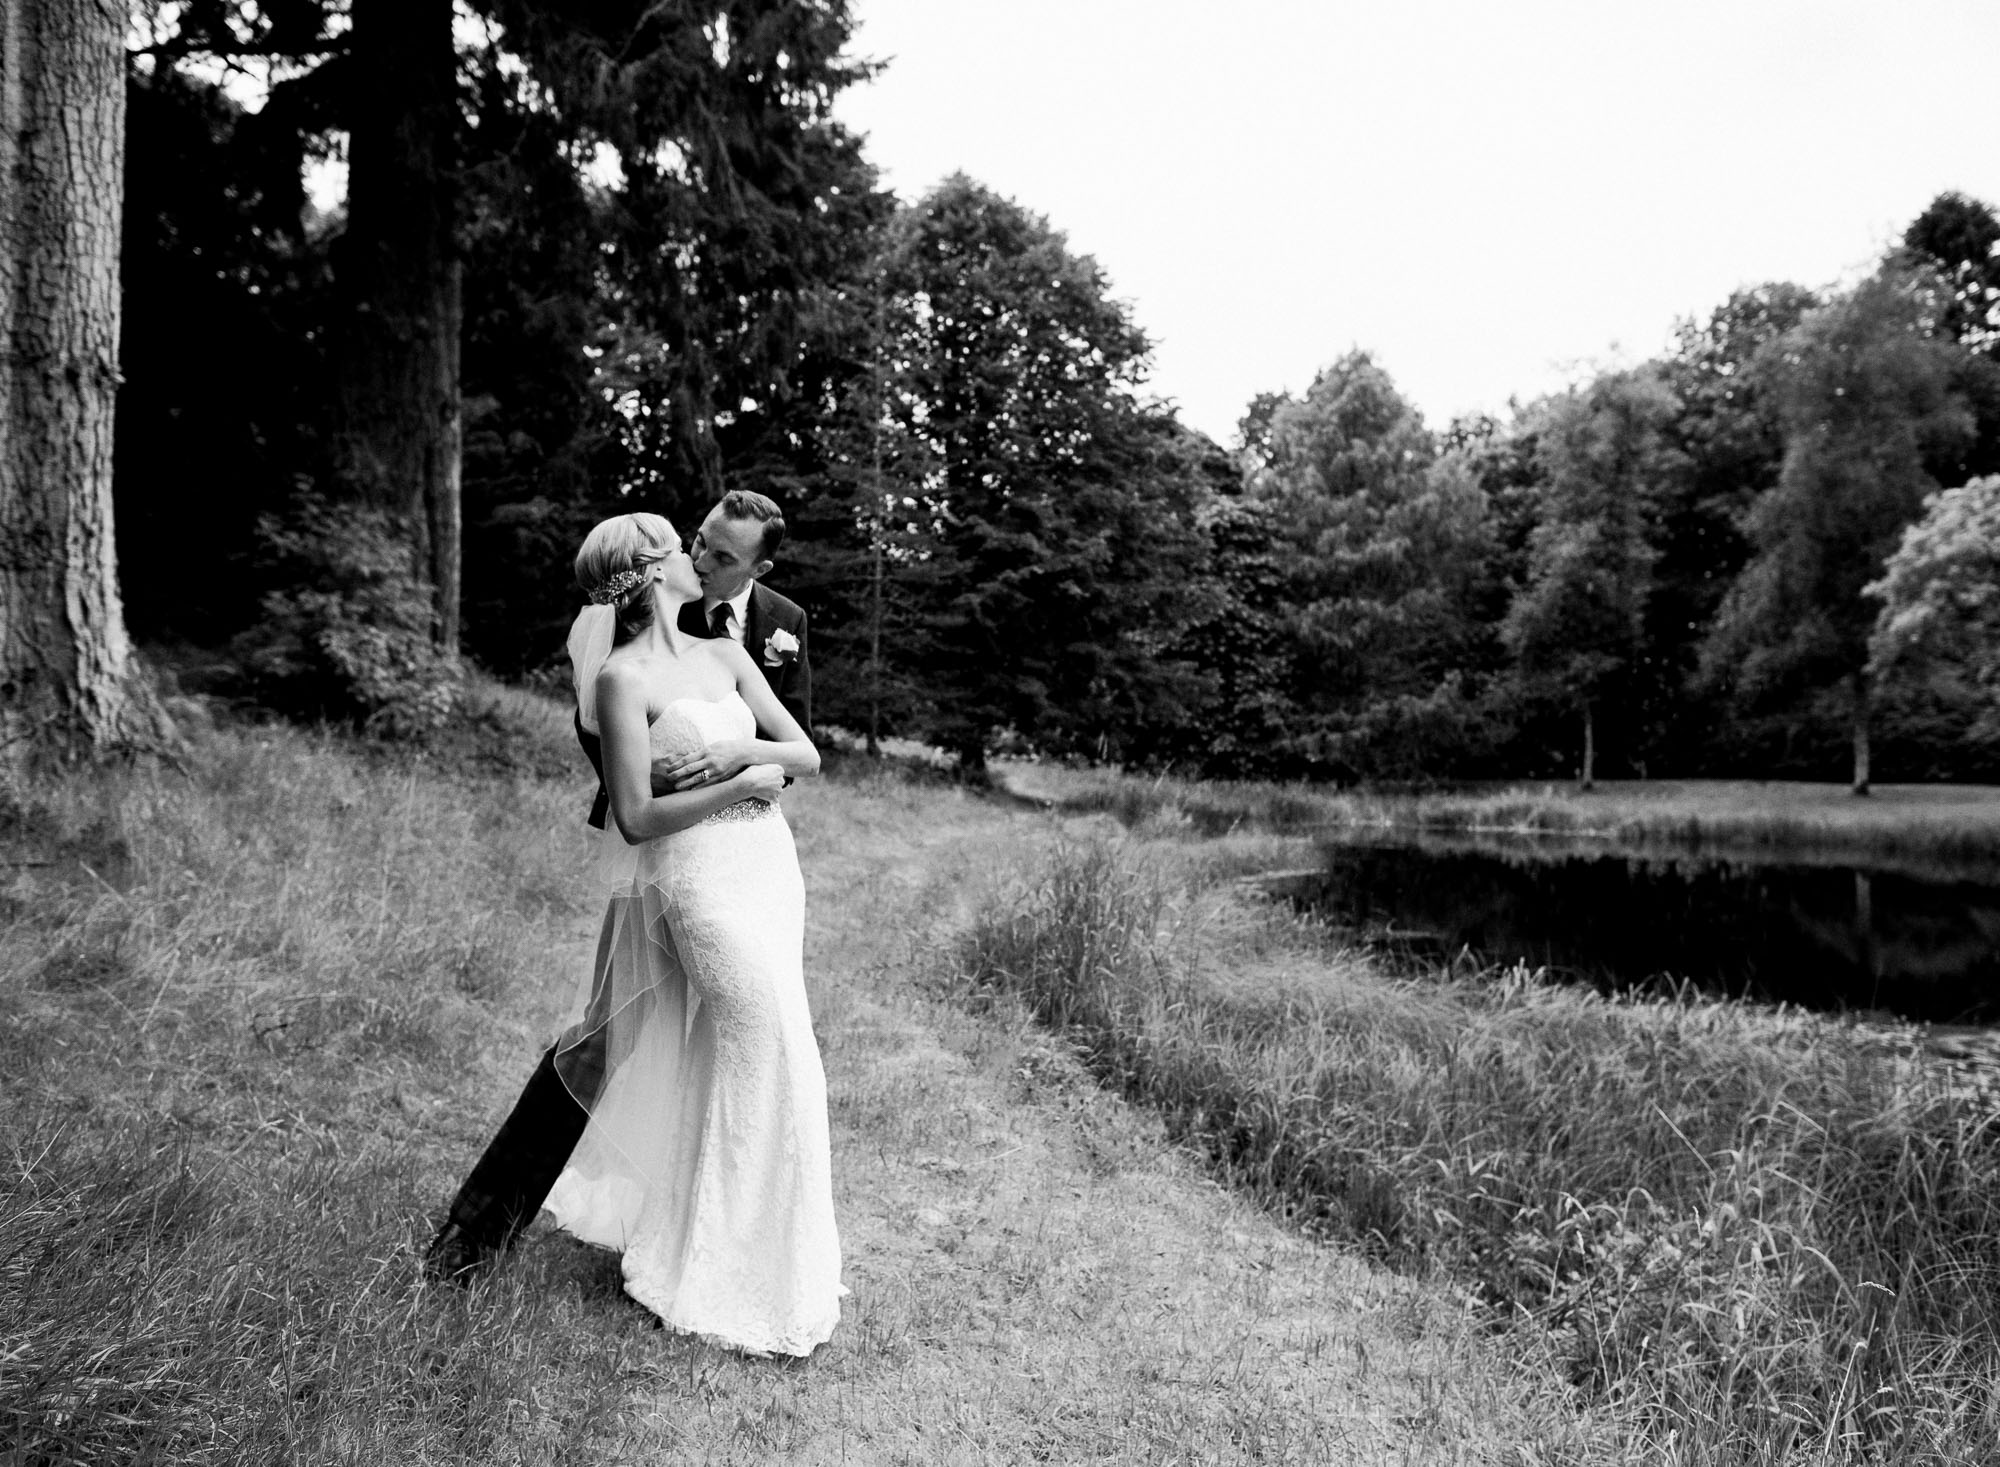 scottish_wedding_blairquhan_castle-83.jpg